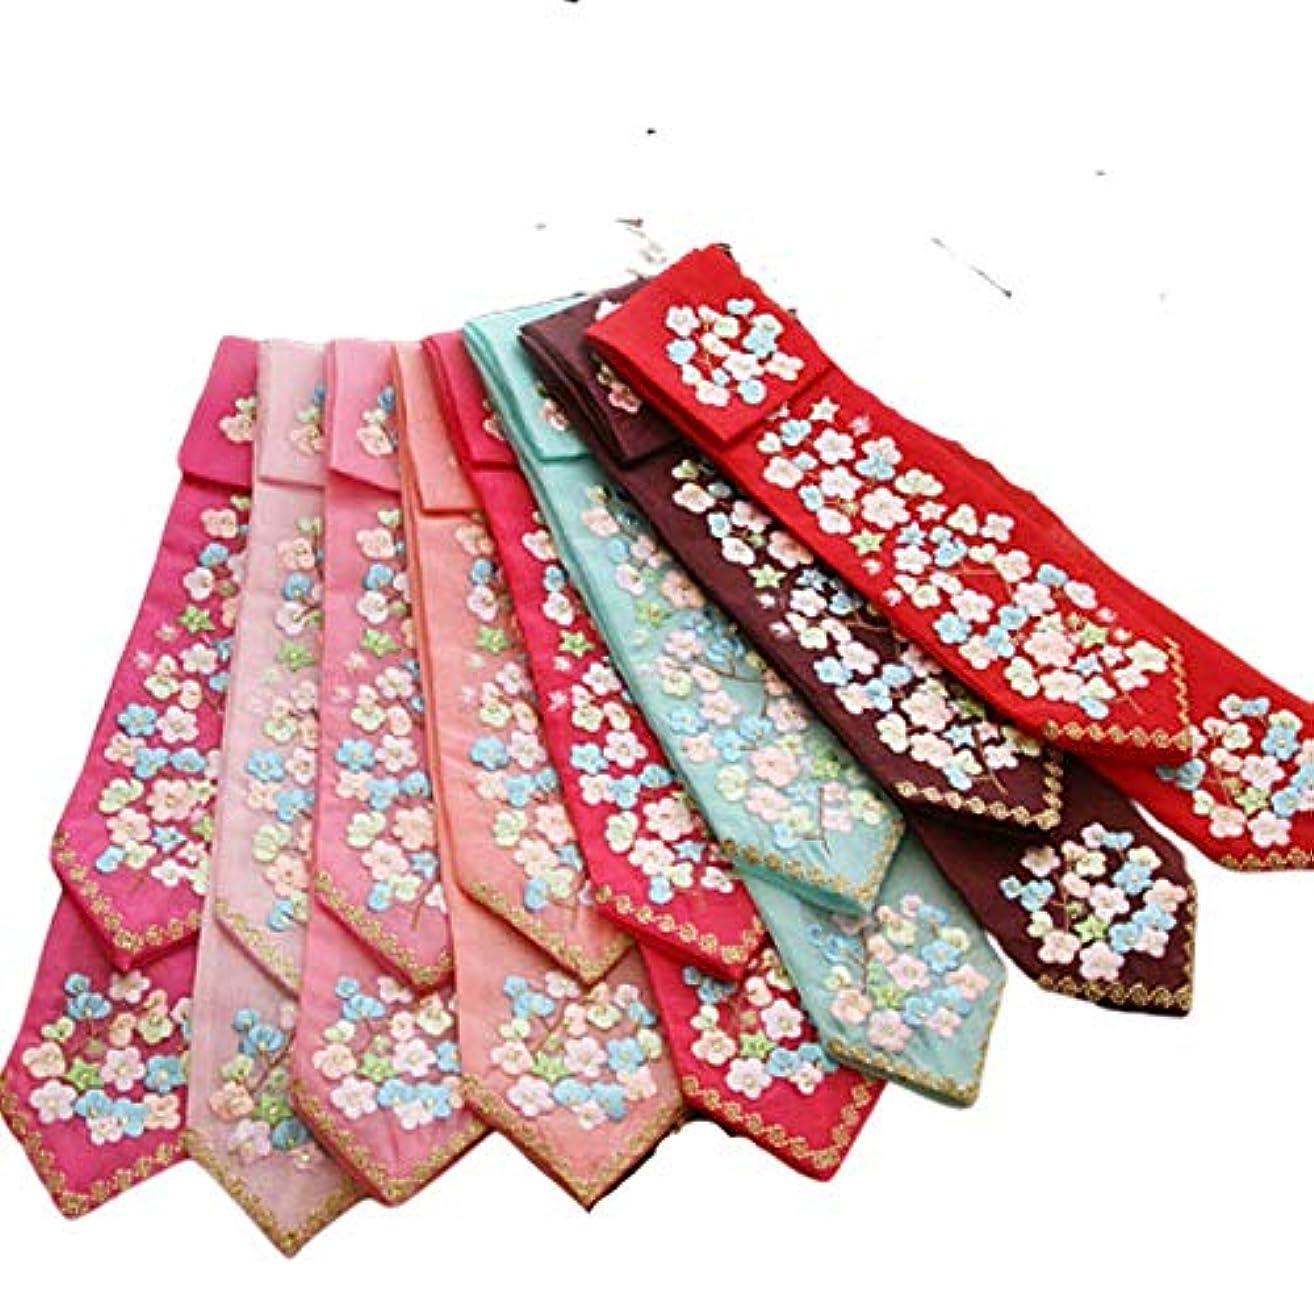 Korean Hanbok Traditional DAENGGI Hair Accessory Women Girls Babies Hairband PIGTAIL RIBBON bassi